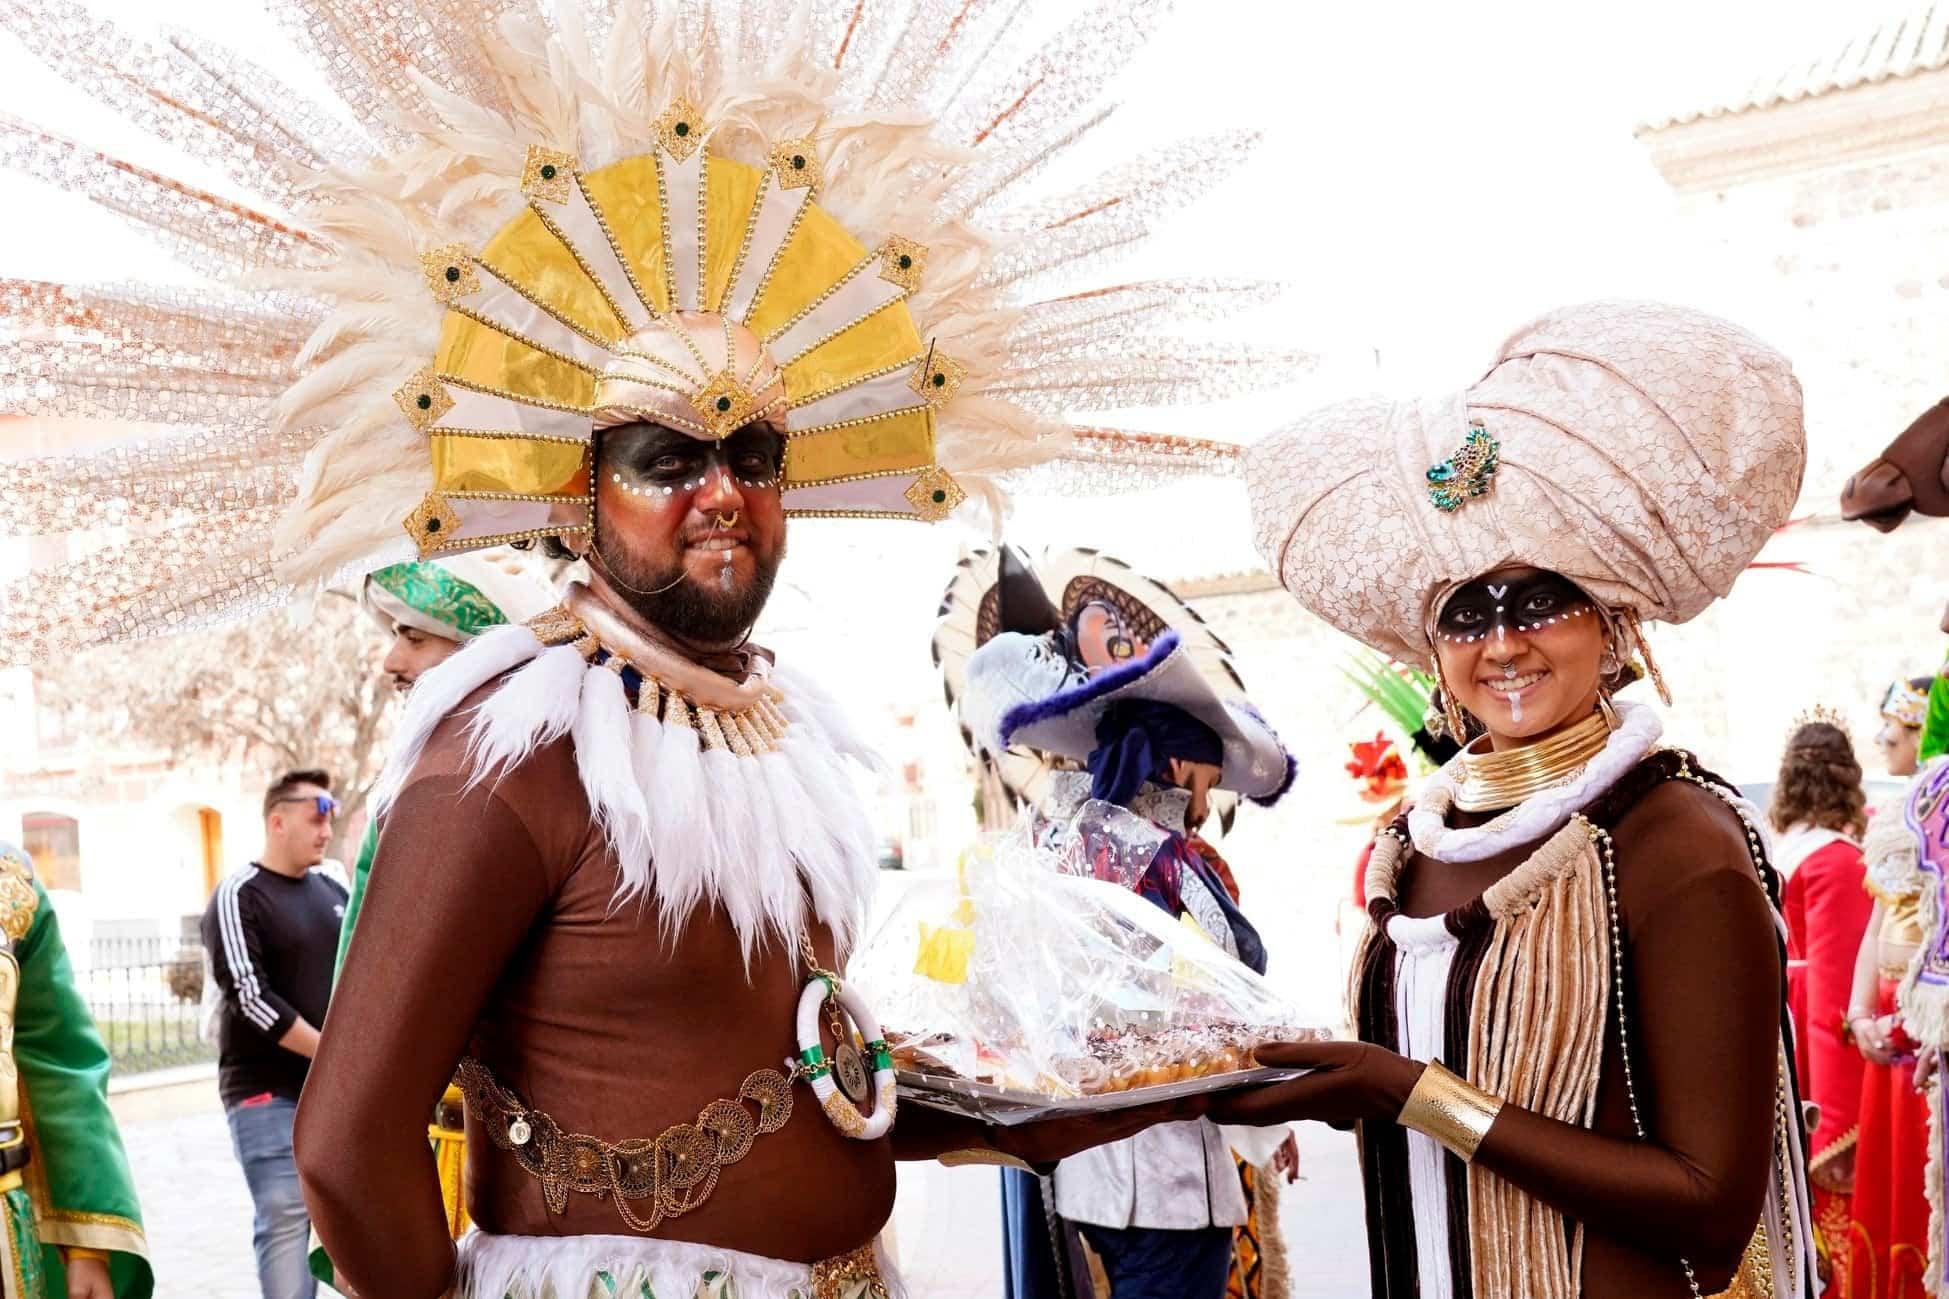 Carnaval de herencia 2020 ofertorio 67 - Selección de fotografías del Ofertorio del Carnaval de Herencia